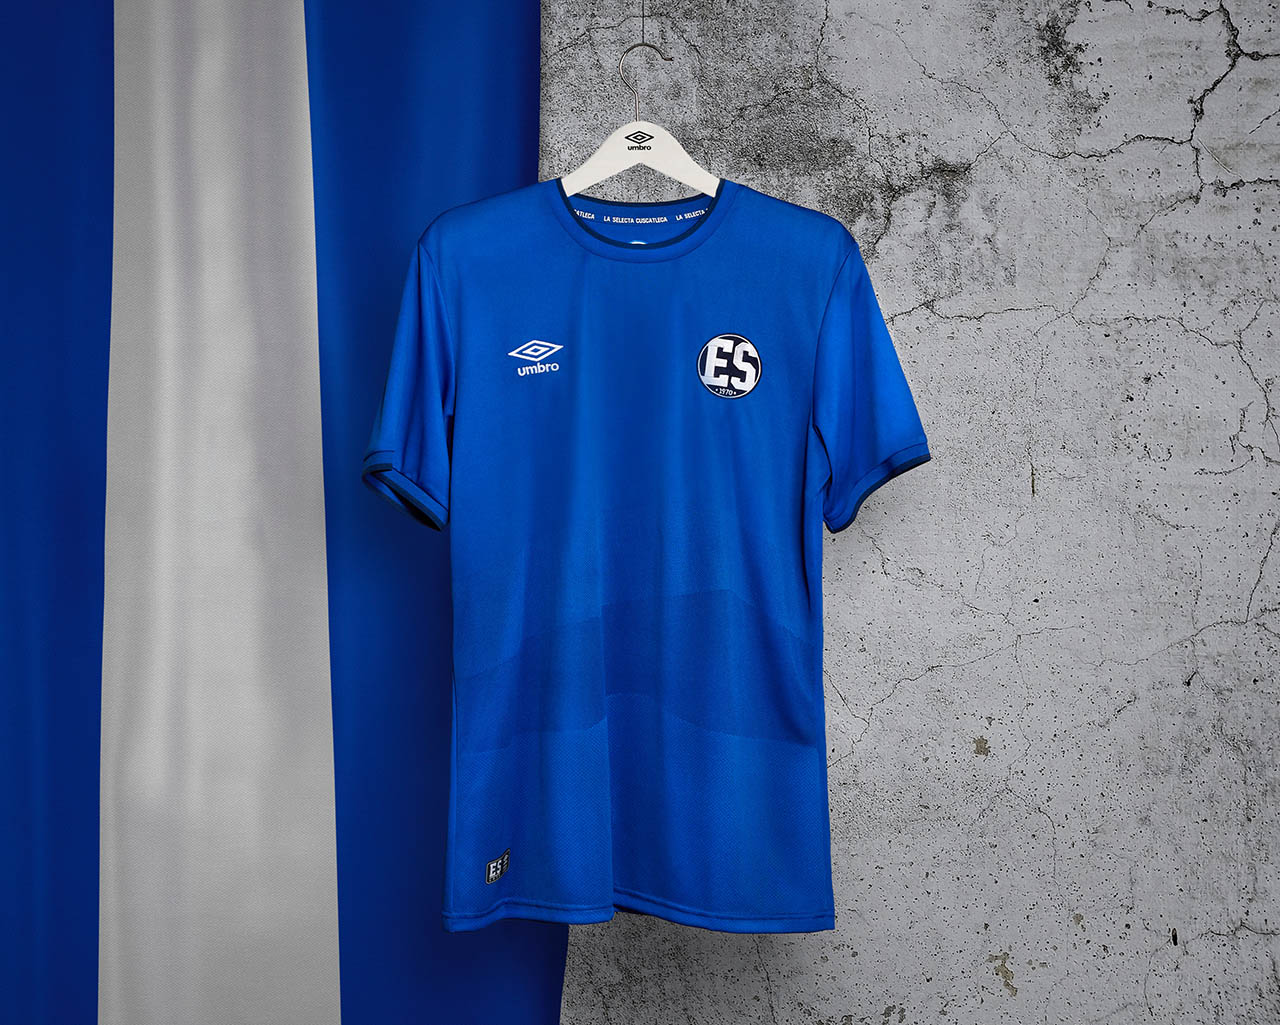 Camisa retrô de El Salvador Copa do Mundo 1970 Umbro